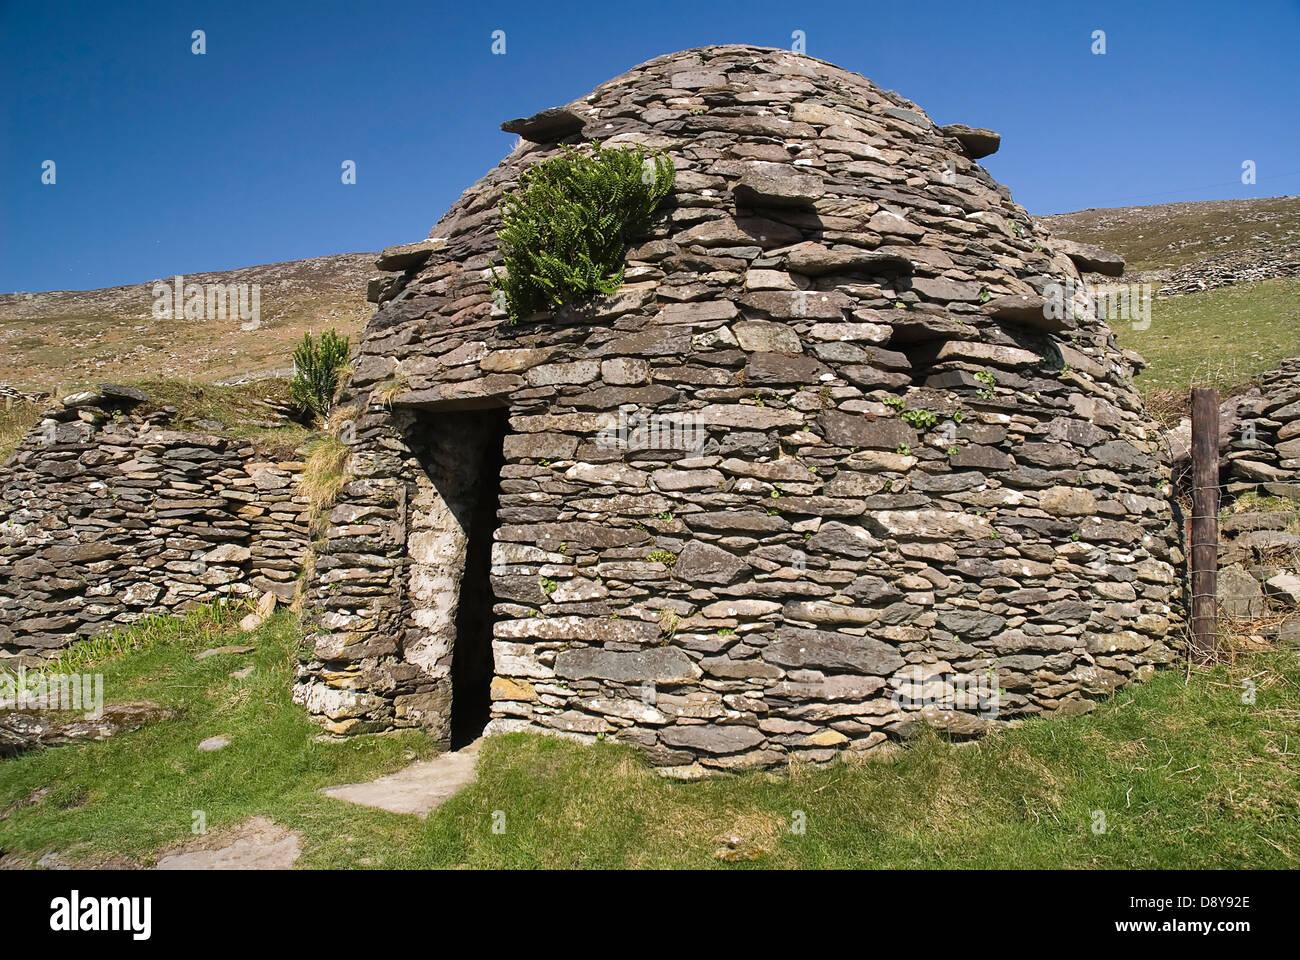 Beehive hut in the Fahan Group Destination Destinations Eire European History Historic Ireland Irish Northern Europe - Stock Image